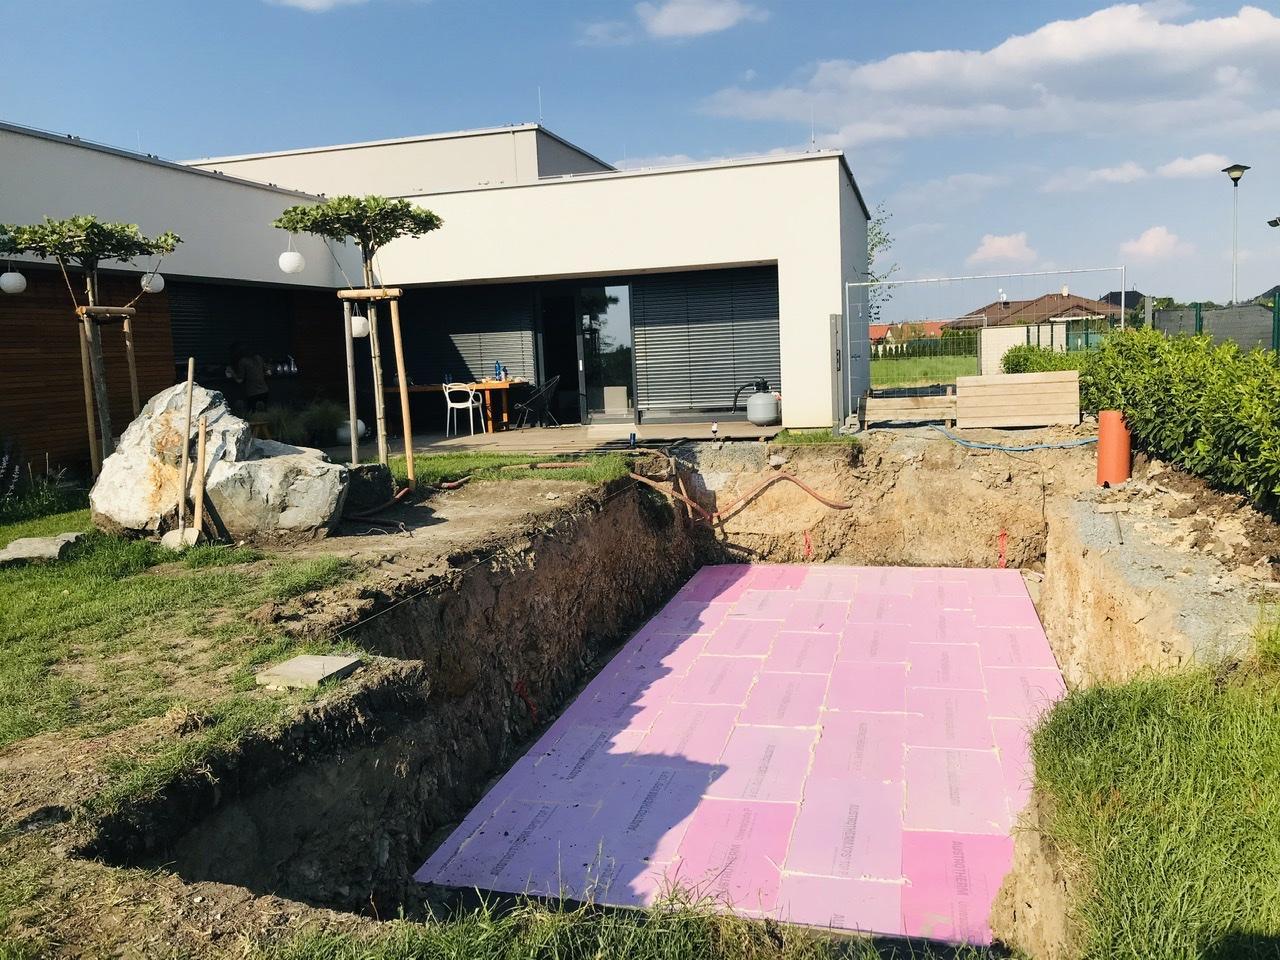 Naše L-ko - 2021 - stále dokončujeme - 6. deň - dokončené prípravné práce, další deň čakáme žeriav a dovezú škrupinku bazéna